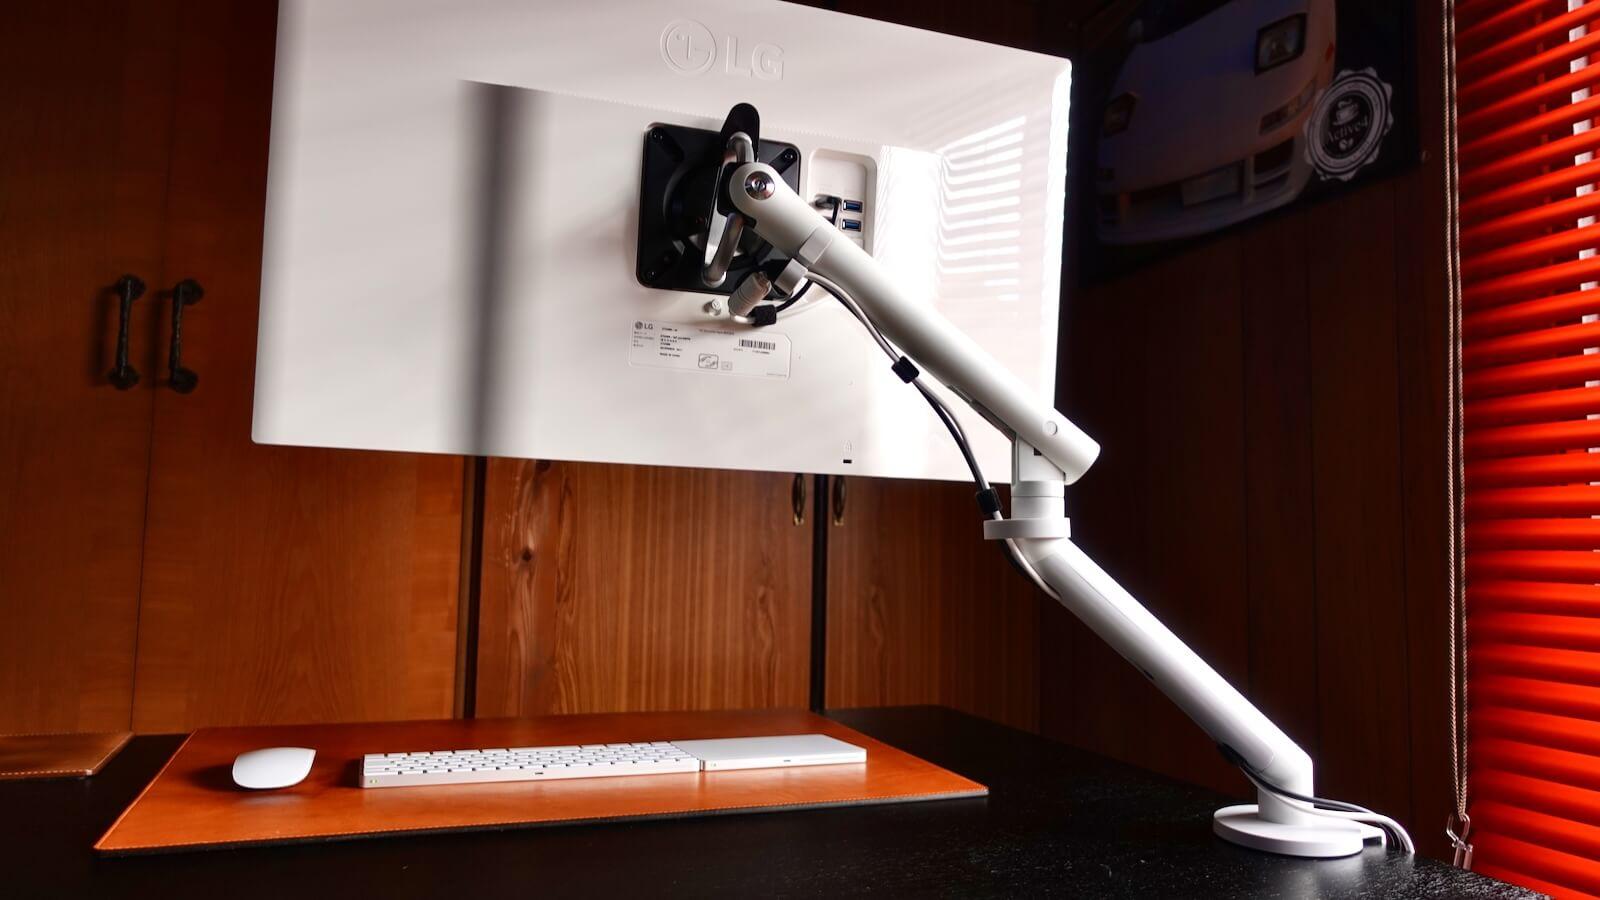 Herman Miller Flo Monitor Arm Operating Range Height 26cm